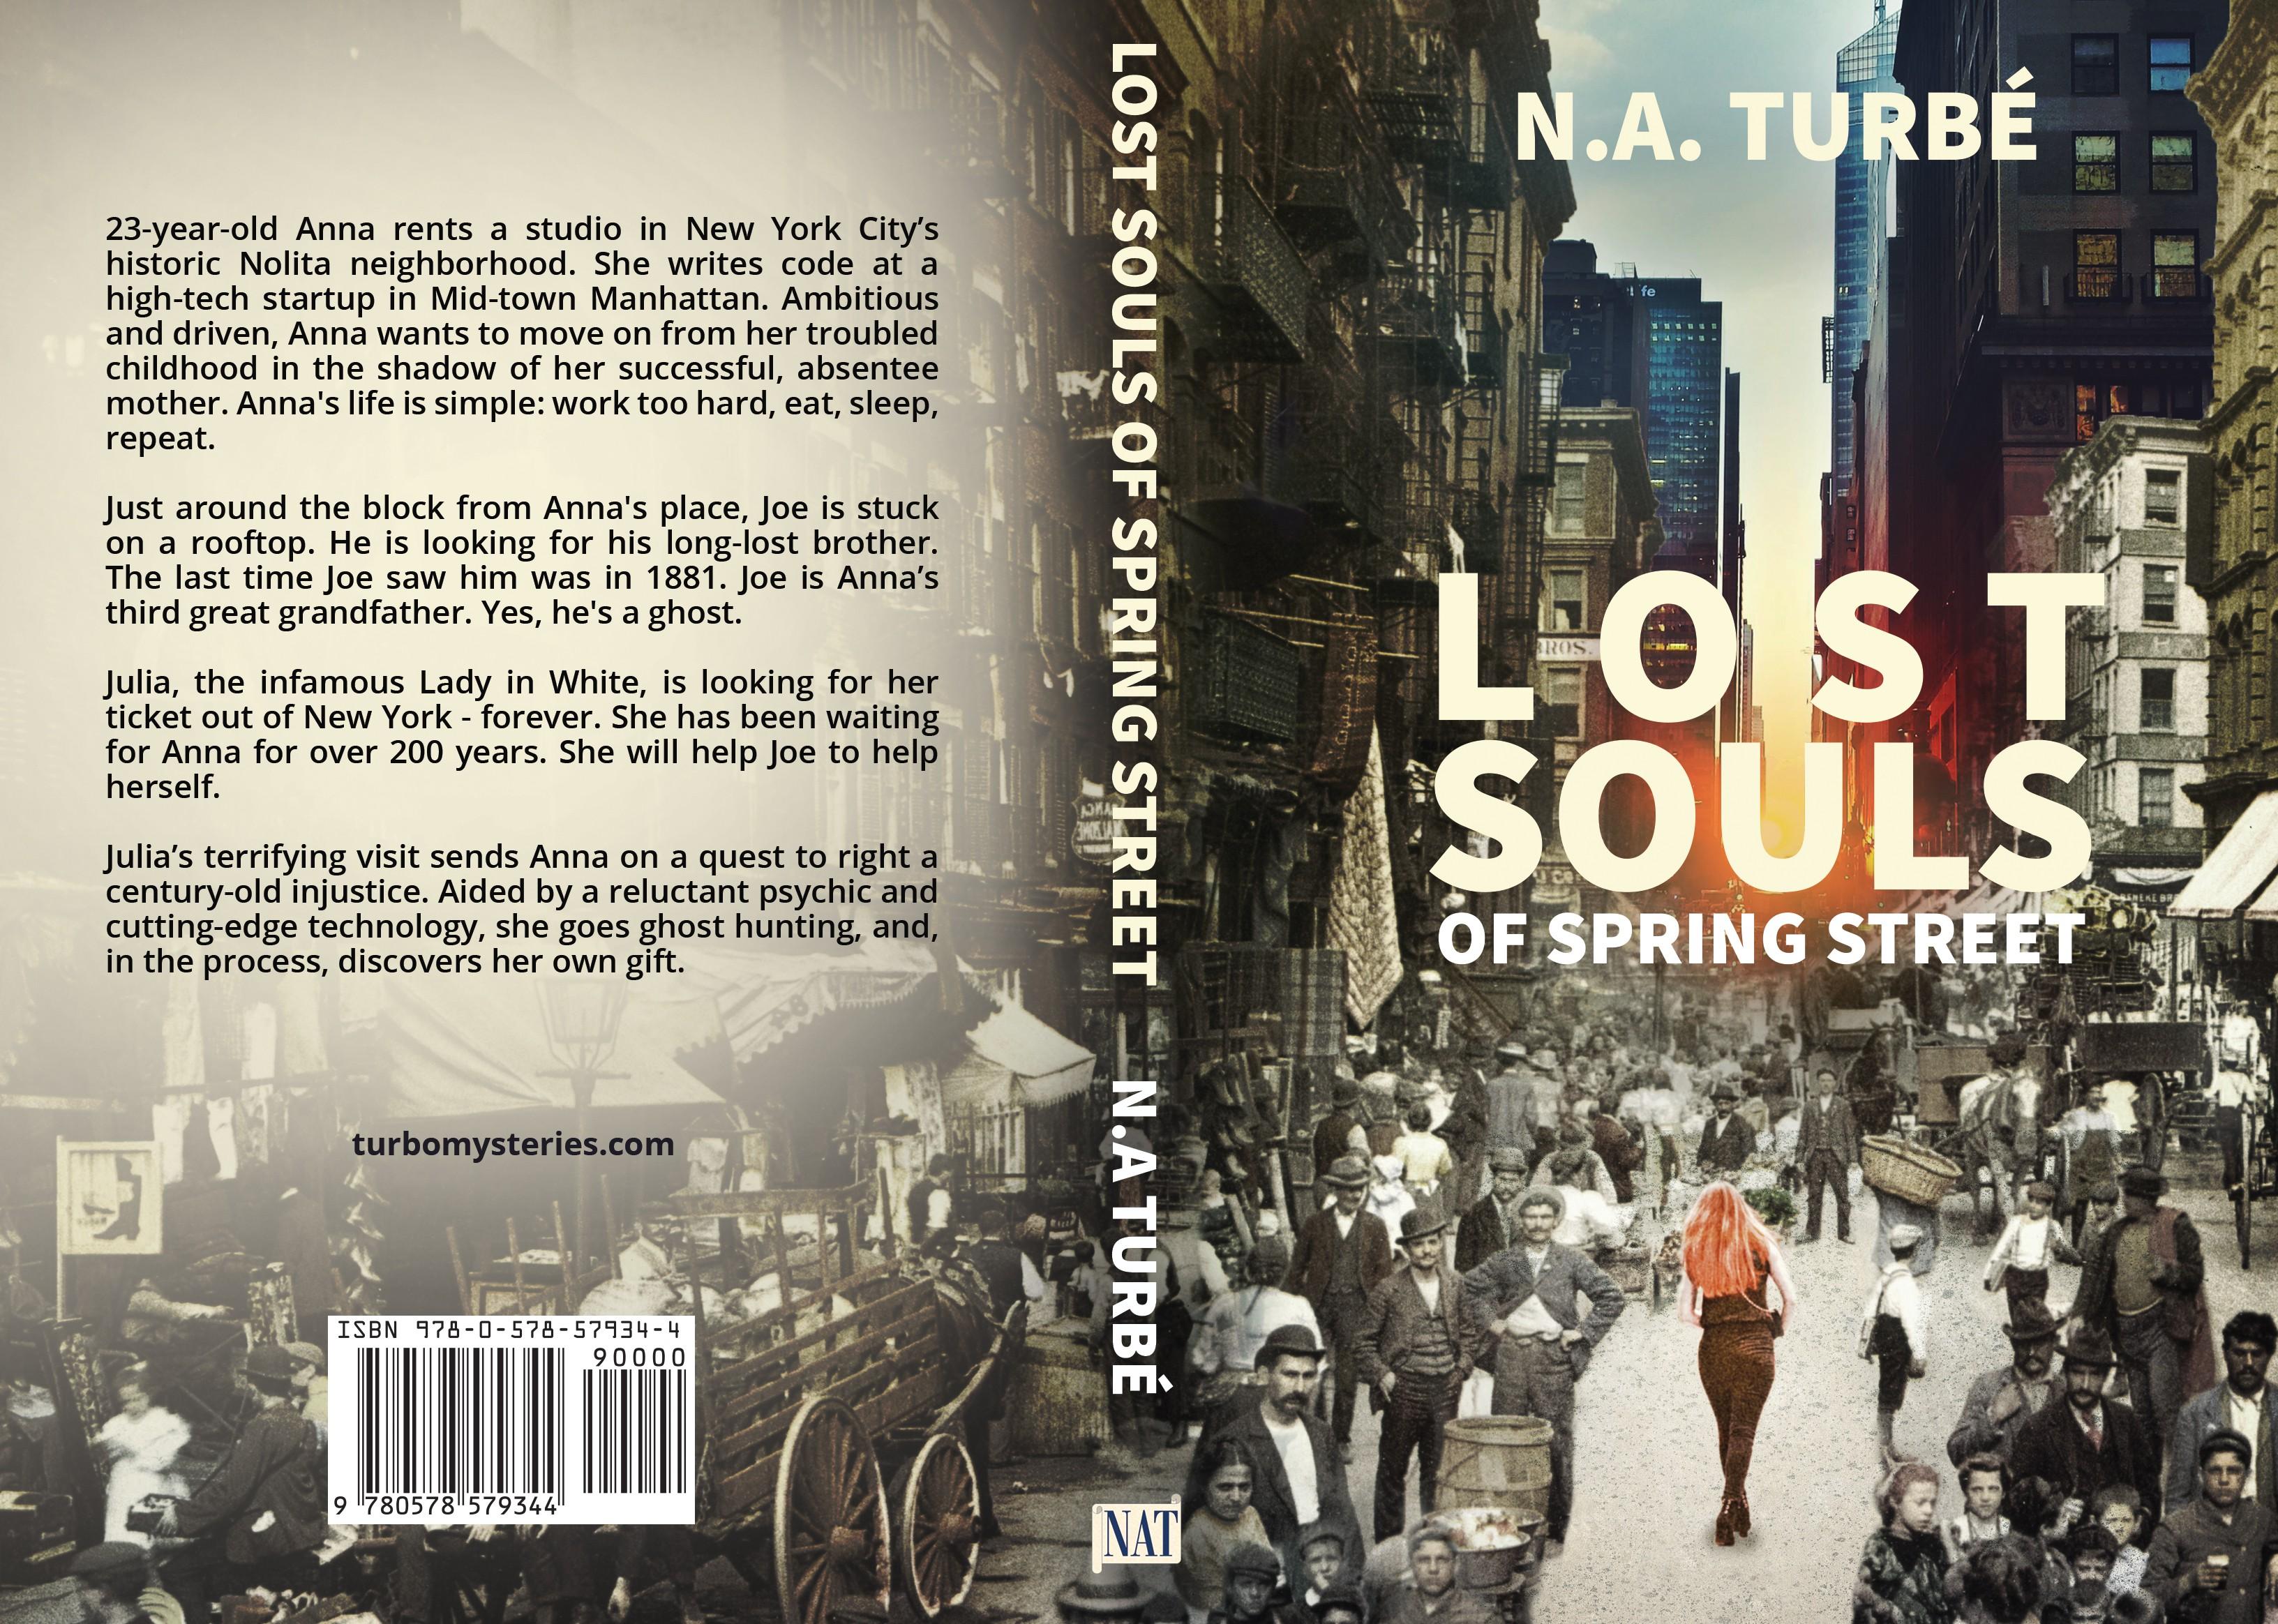 Lost Souls of Spring Street